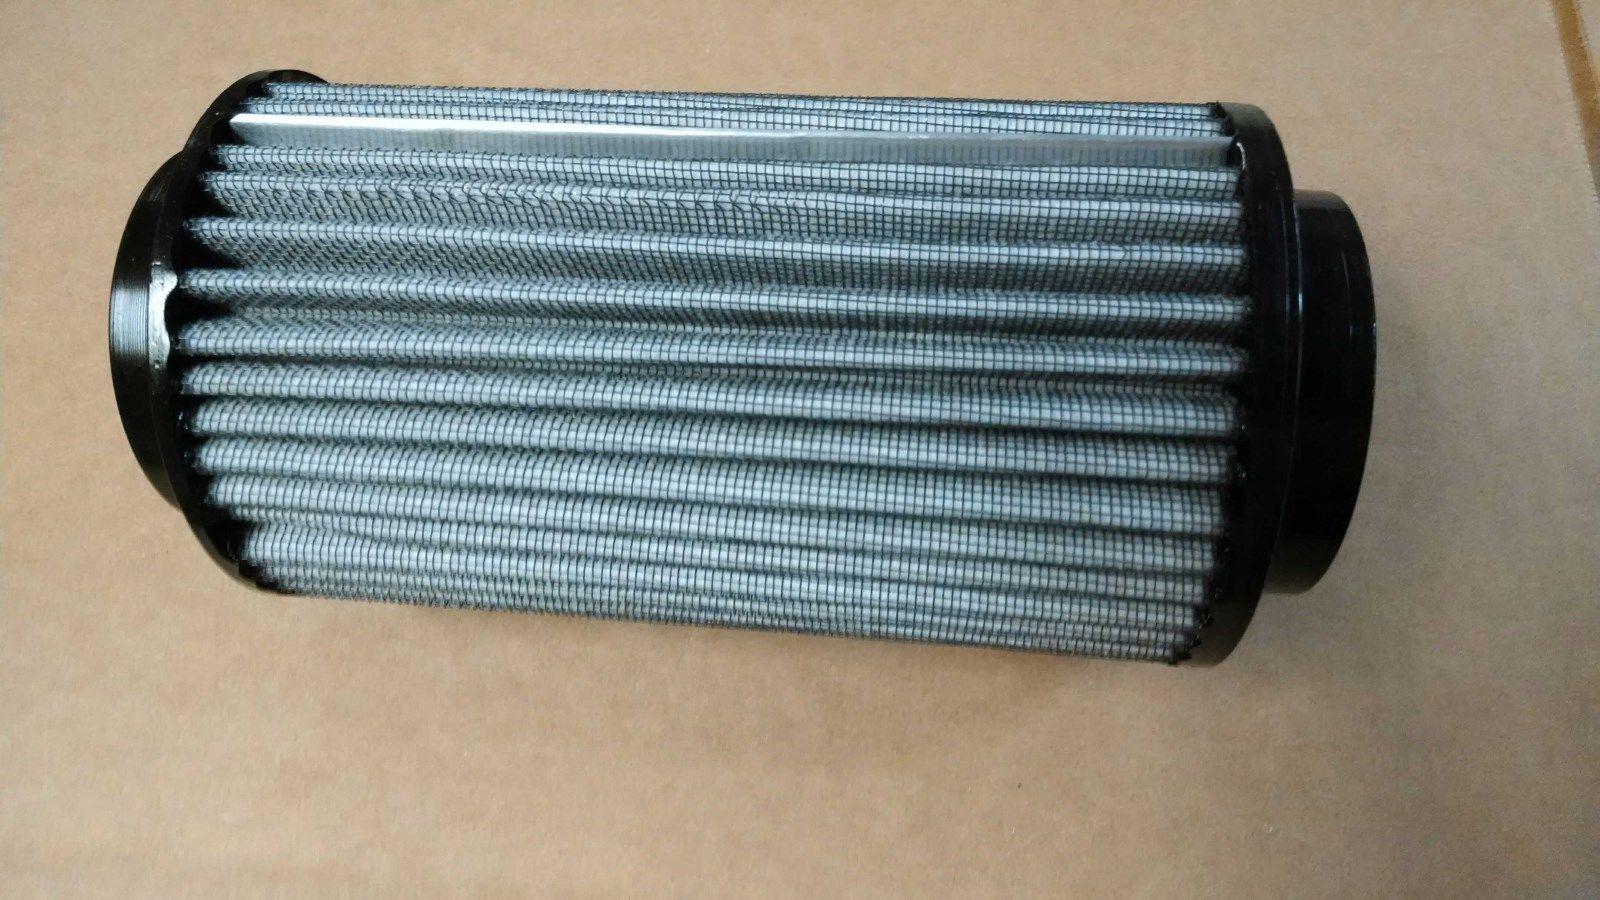 Polaris Scrambler 850 Trail Tamer Muffler Plus High Flow Air Filter Webb Fuel Filters Lightbox